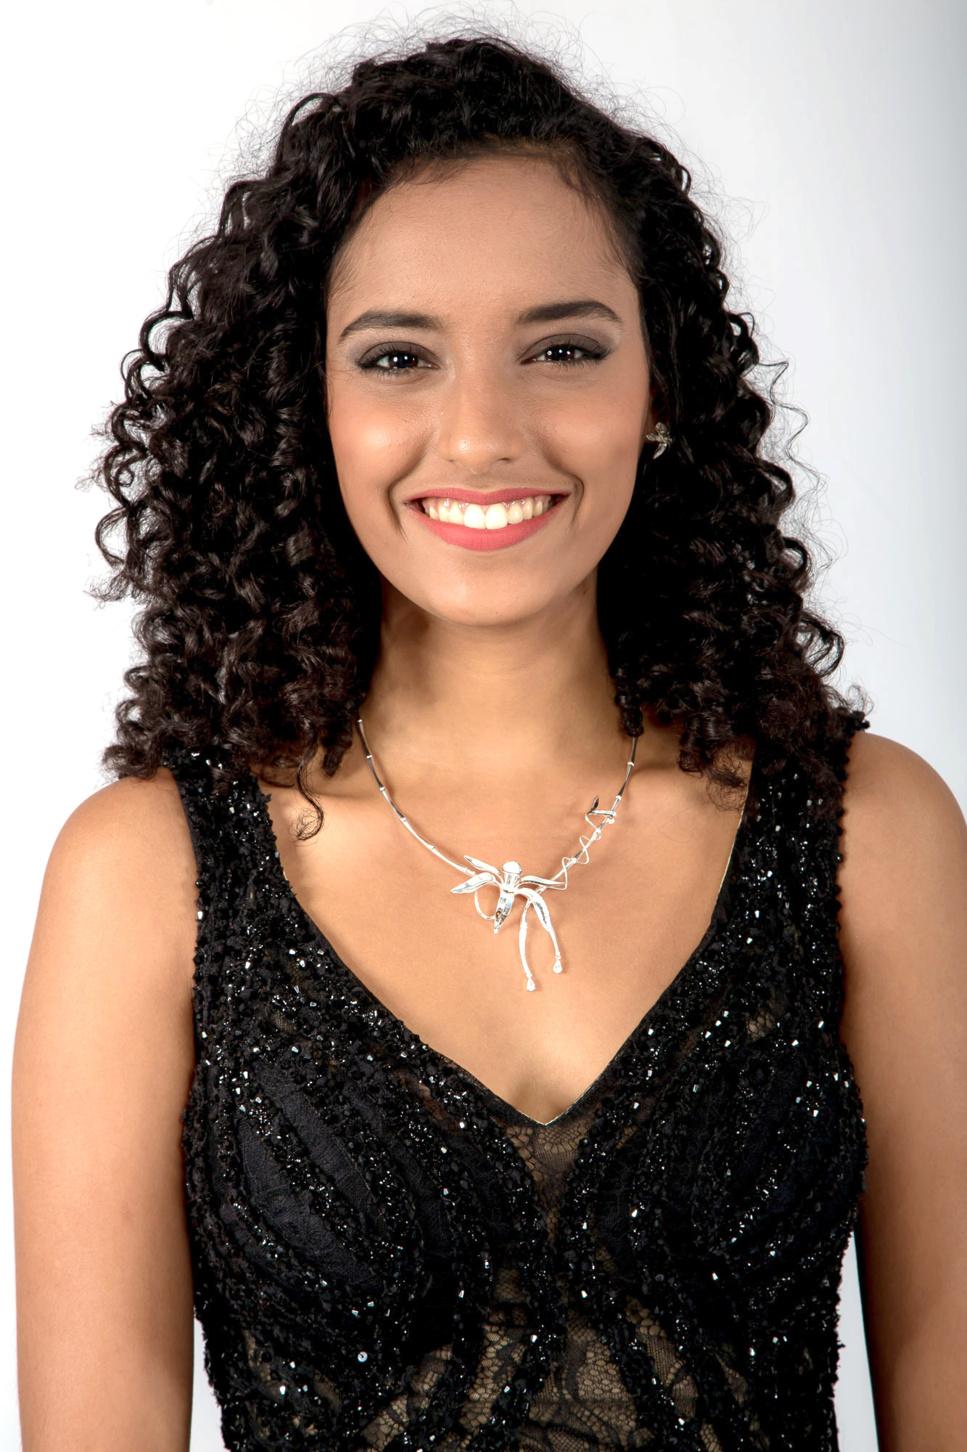 5. Elisa Villard